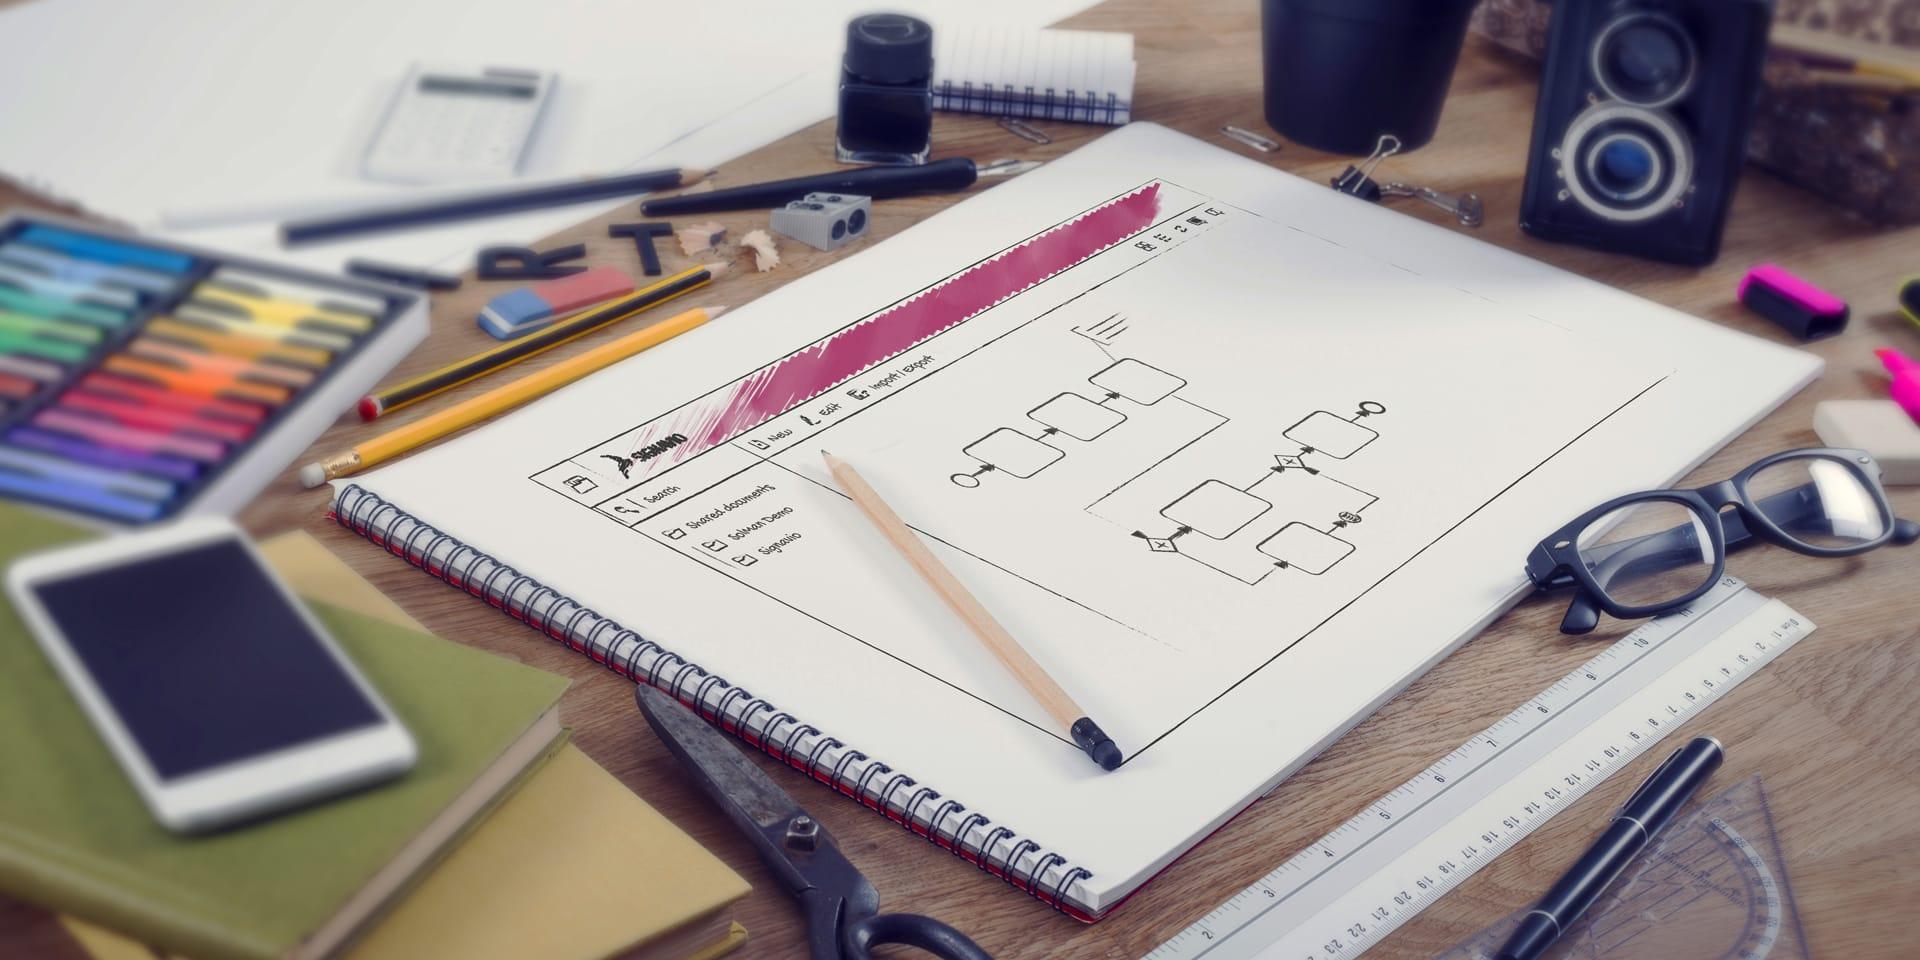 Signavio-Design Block und Stift